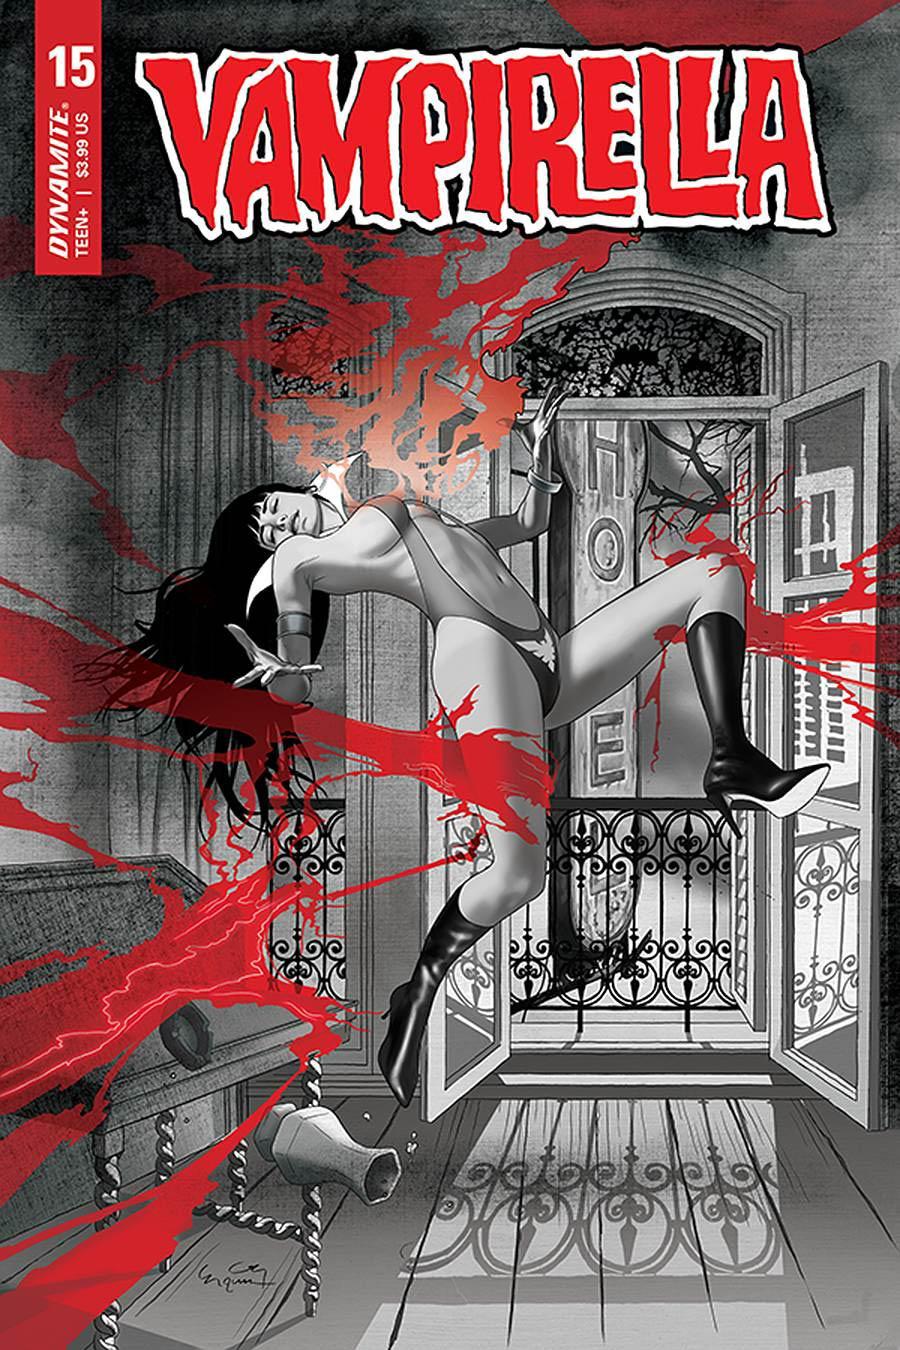 Vampirella Vol 8 #15 Cover D Variant Ergun Gunduz Cover